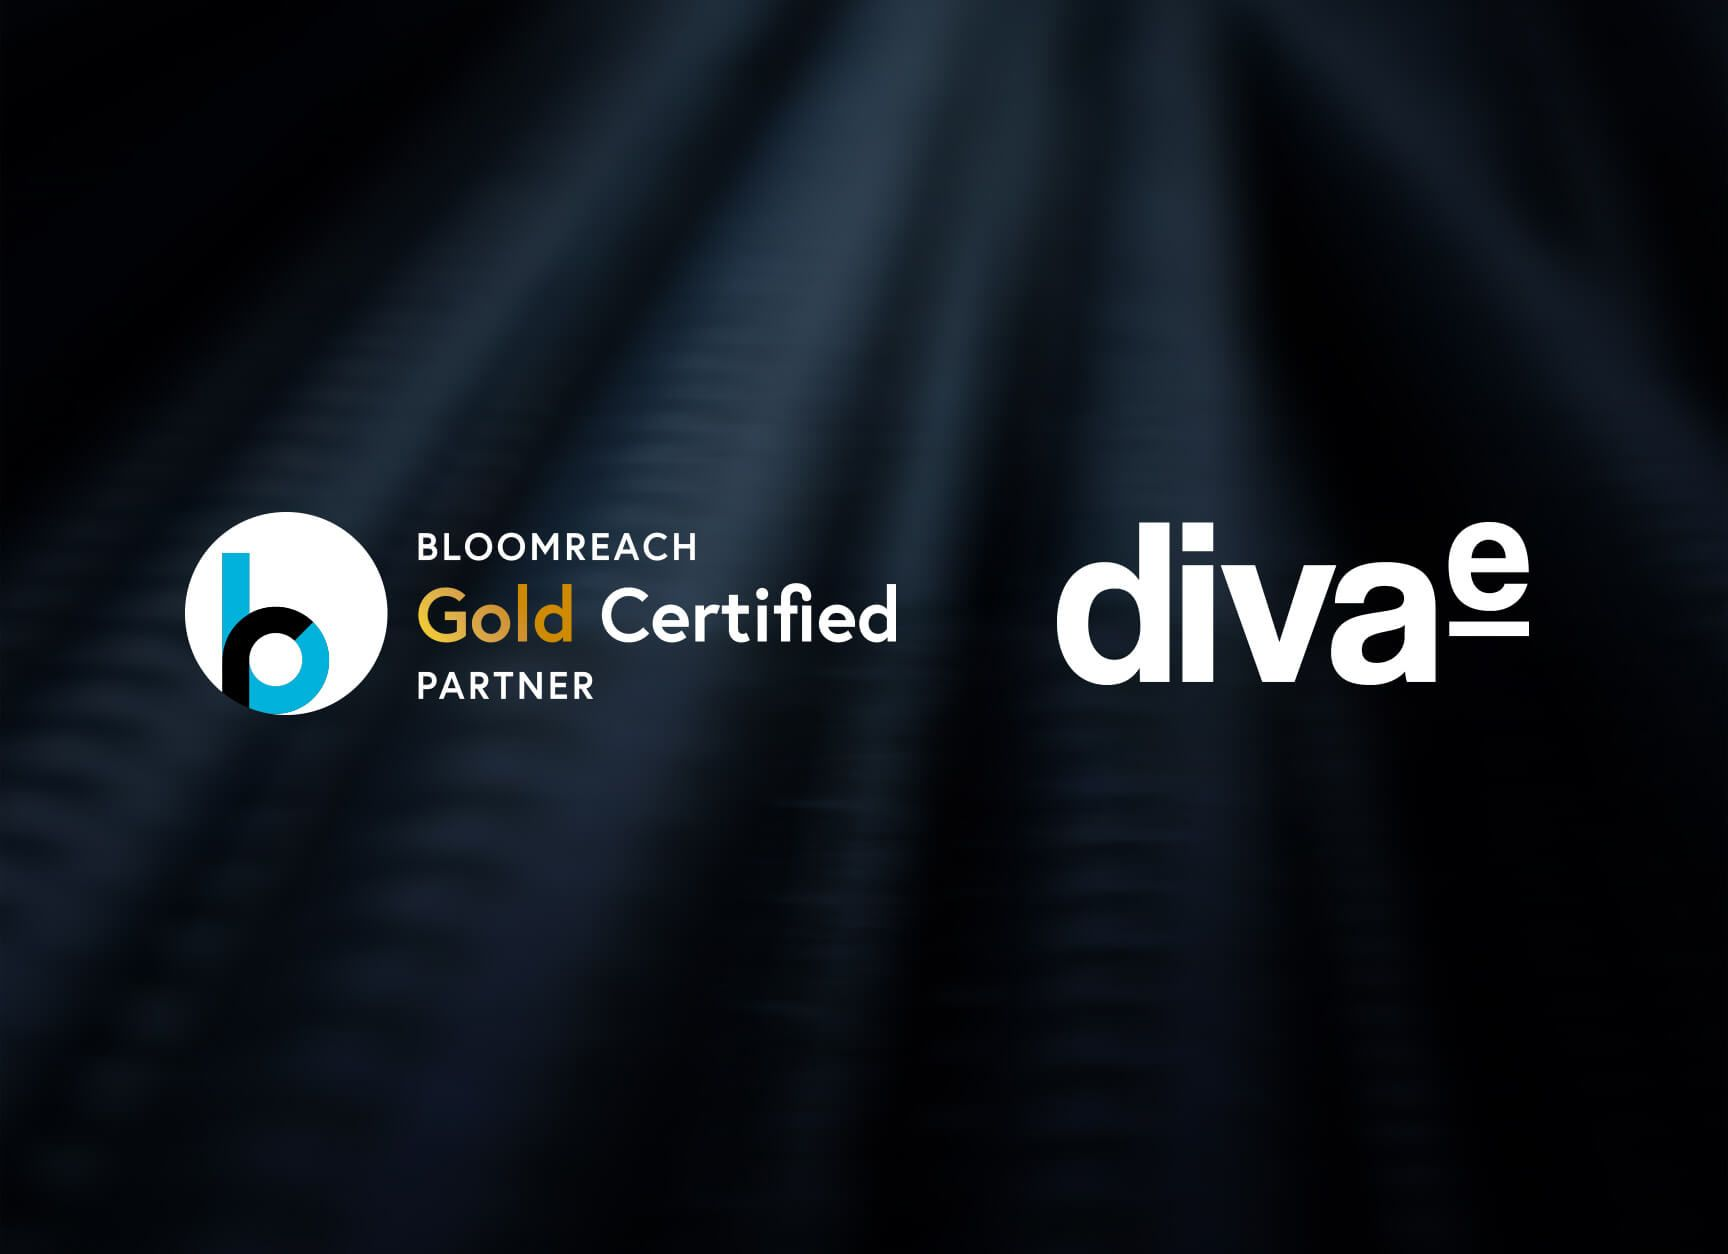 BloomReach und diva-e verlängern Goldpartnerschaft